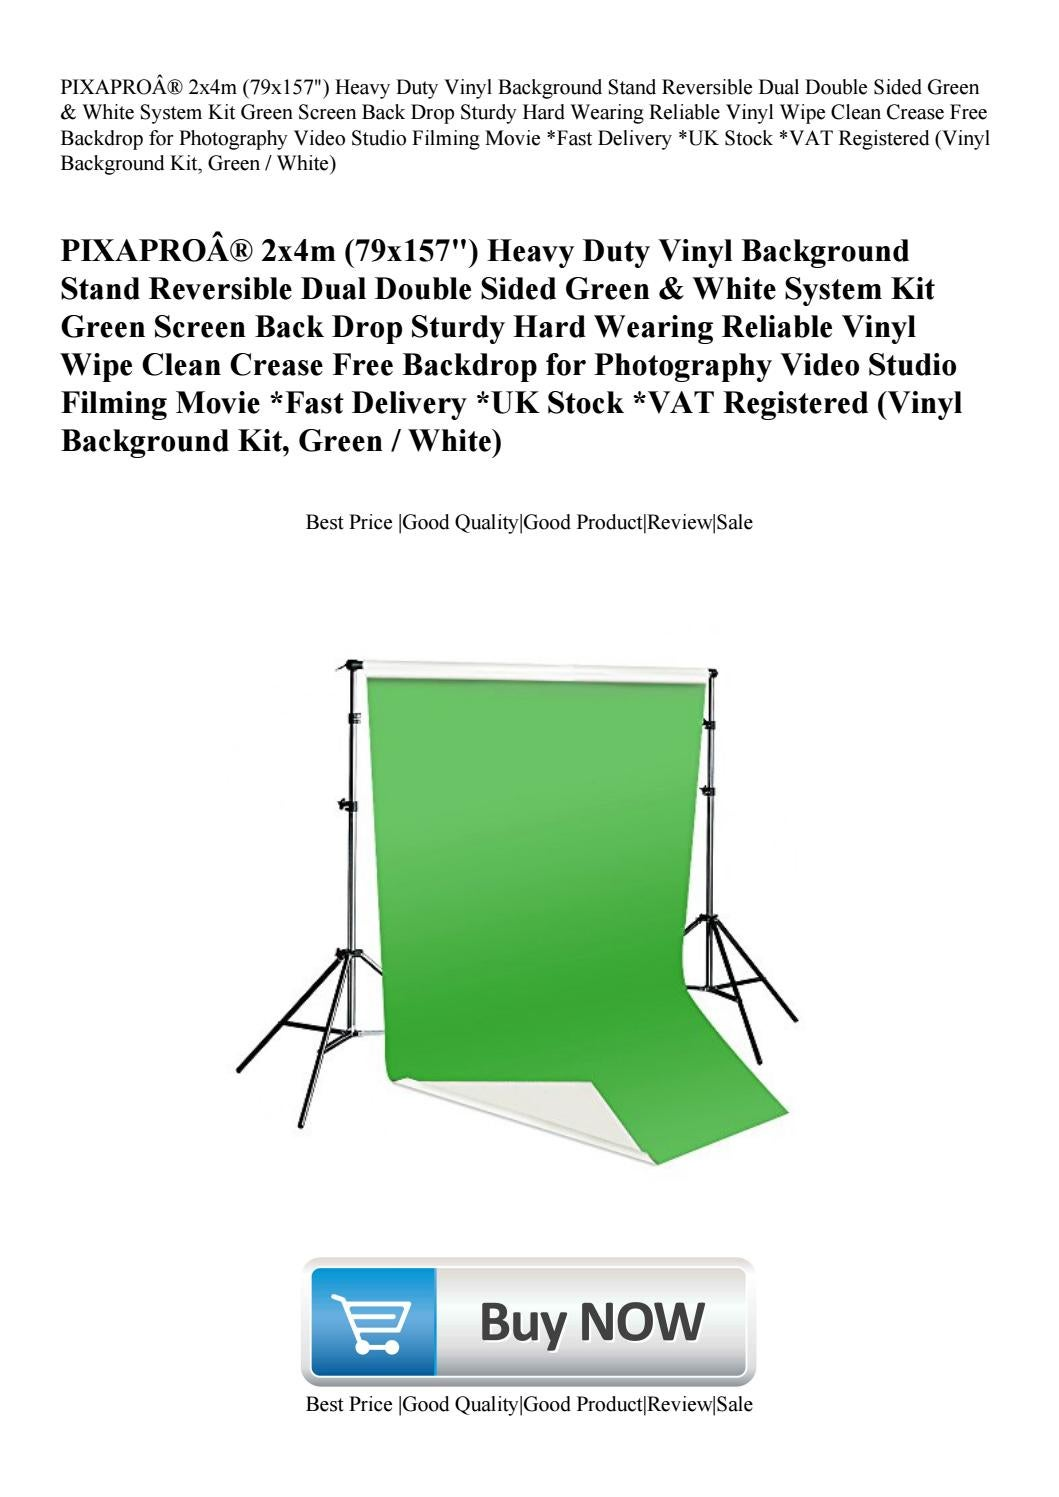 PIXAPRO® 2x4m (79x157) Heavy Duty Vinyl Background Stand